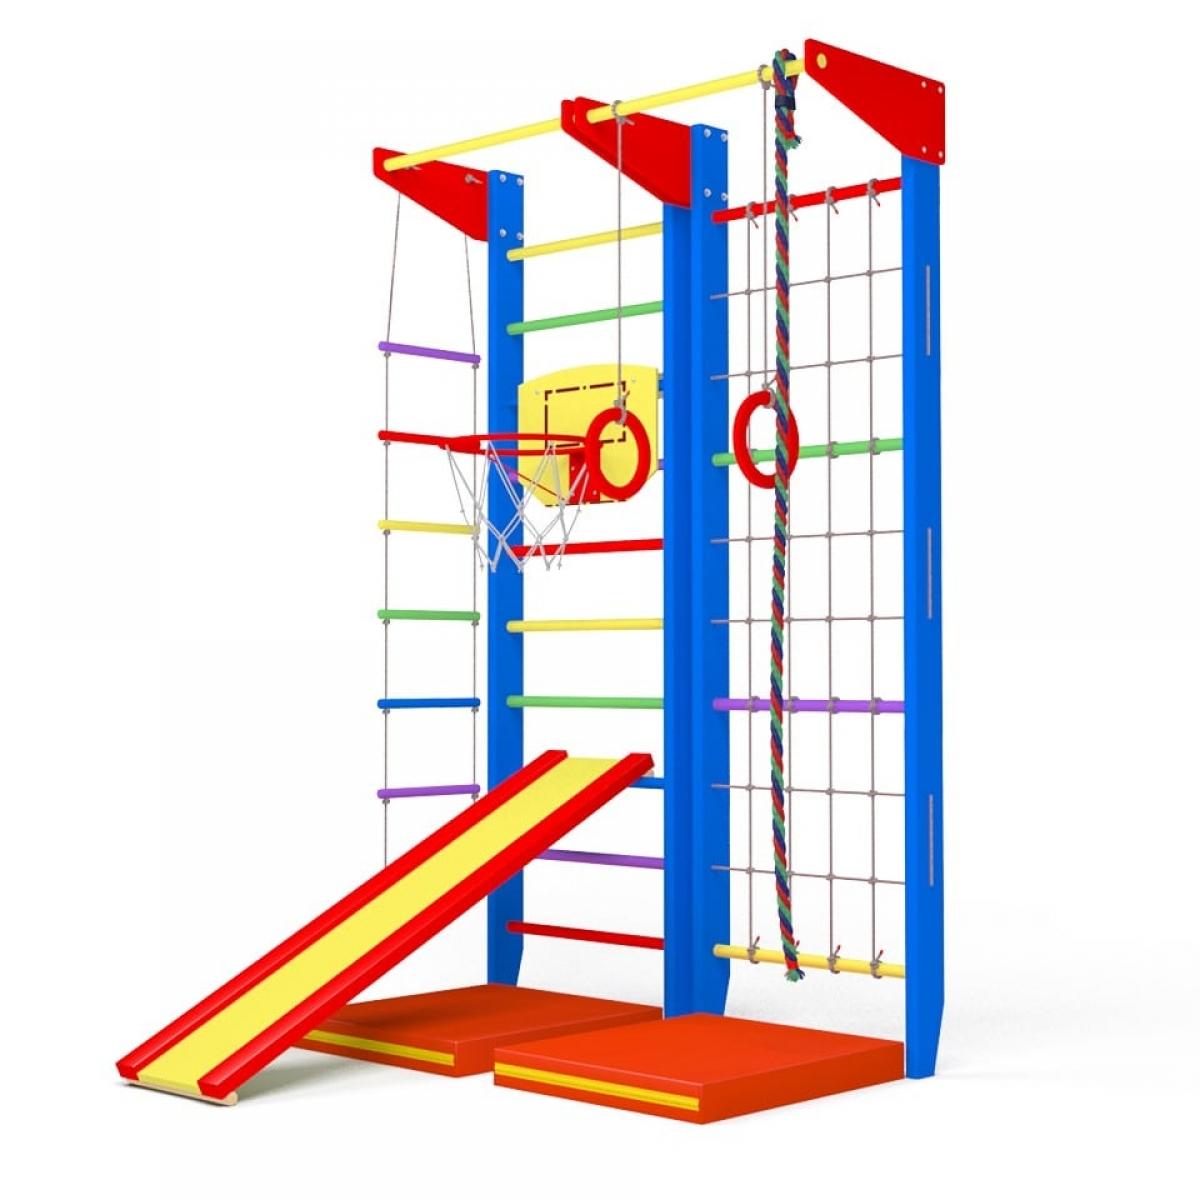 Детский спортивный уголок Крепыш 03 Малыш